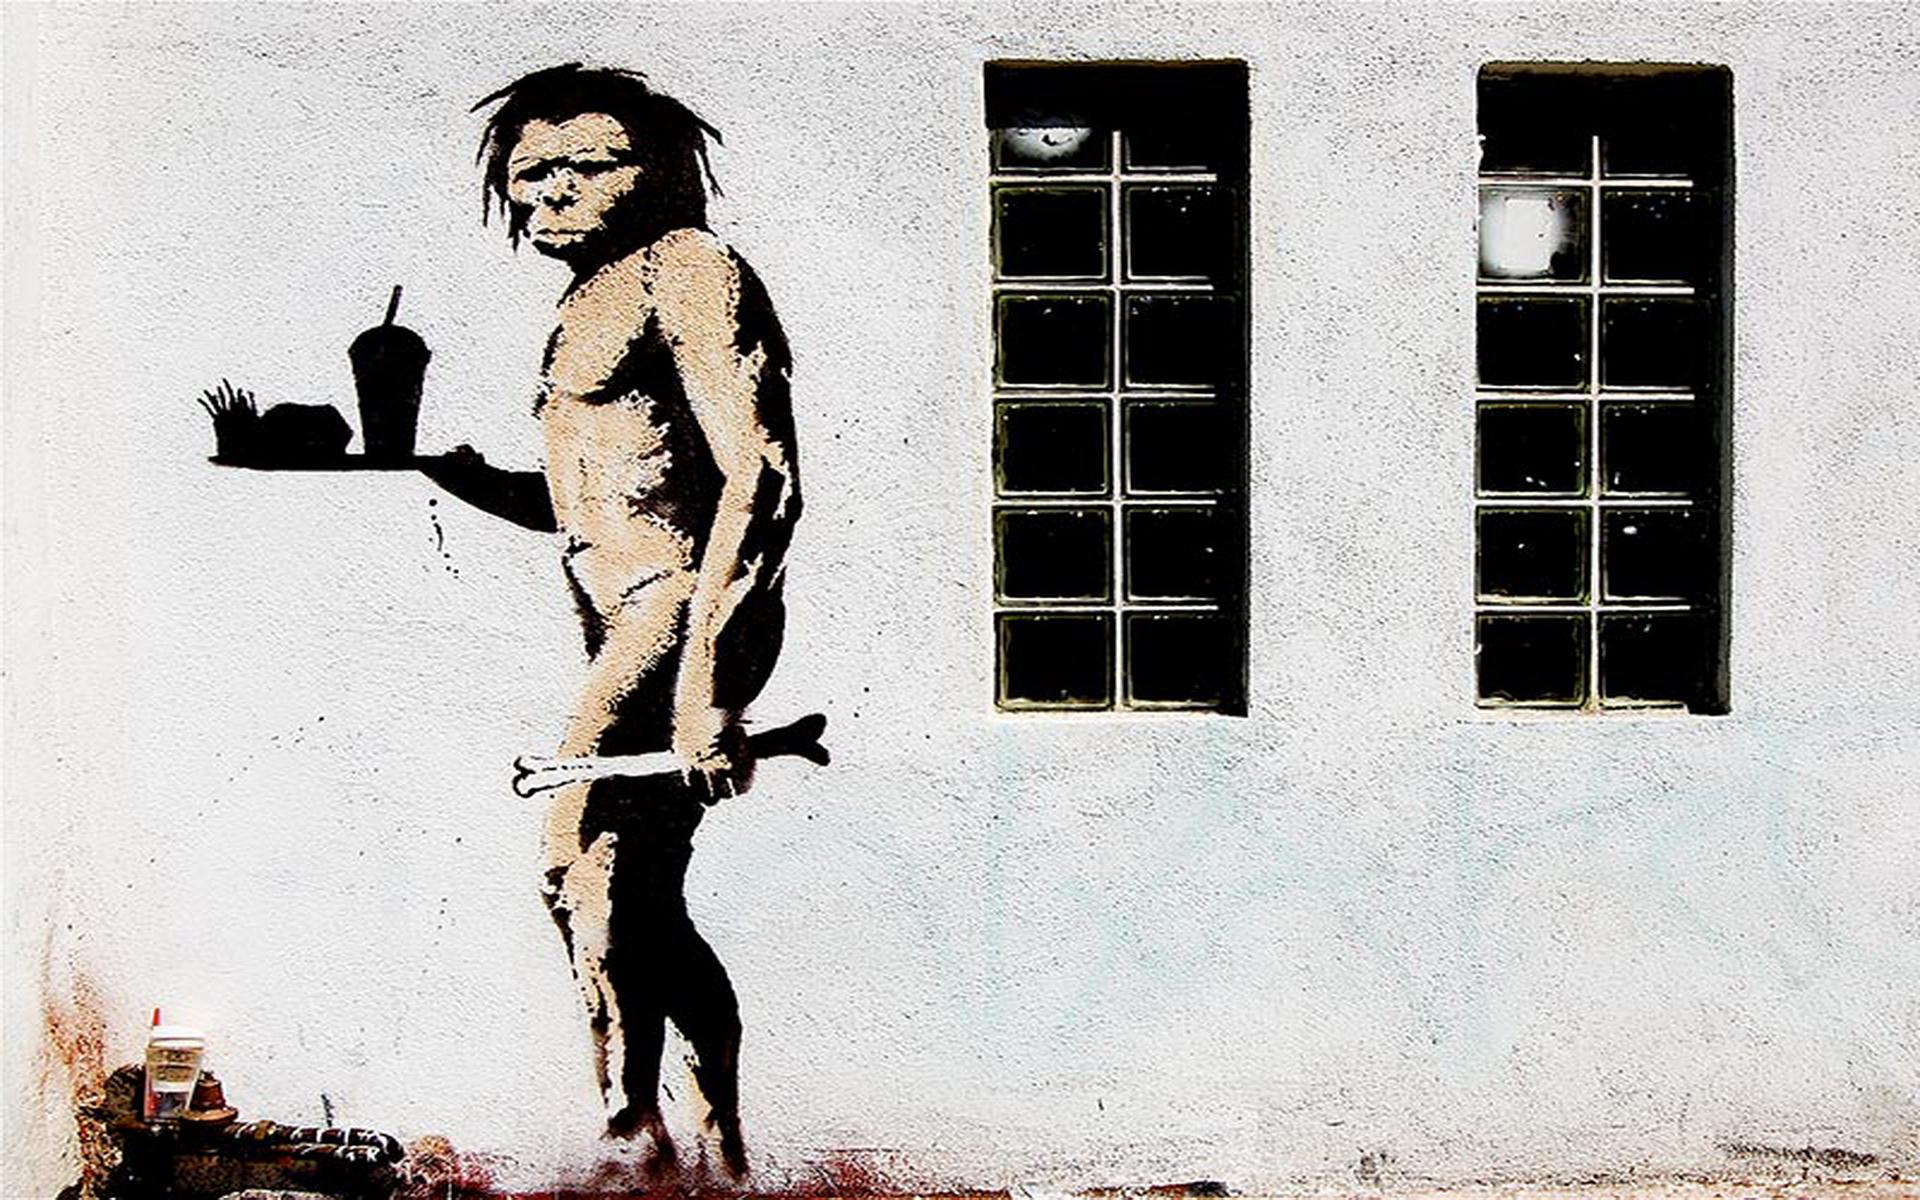 Banksy Wallpaper 3, Banksy Wallpapers, Art Wallpapers, Street Wall Art ...